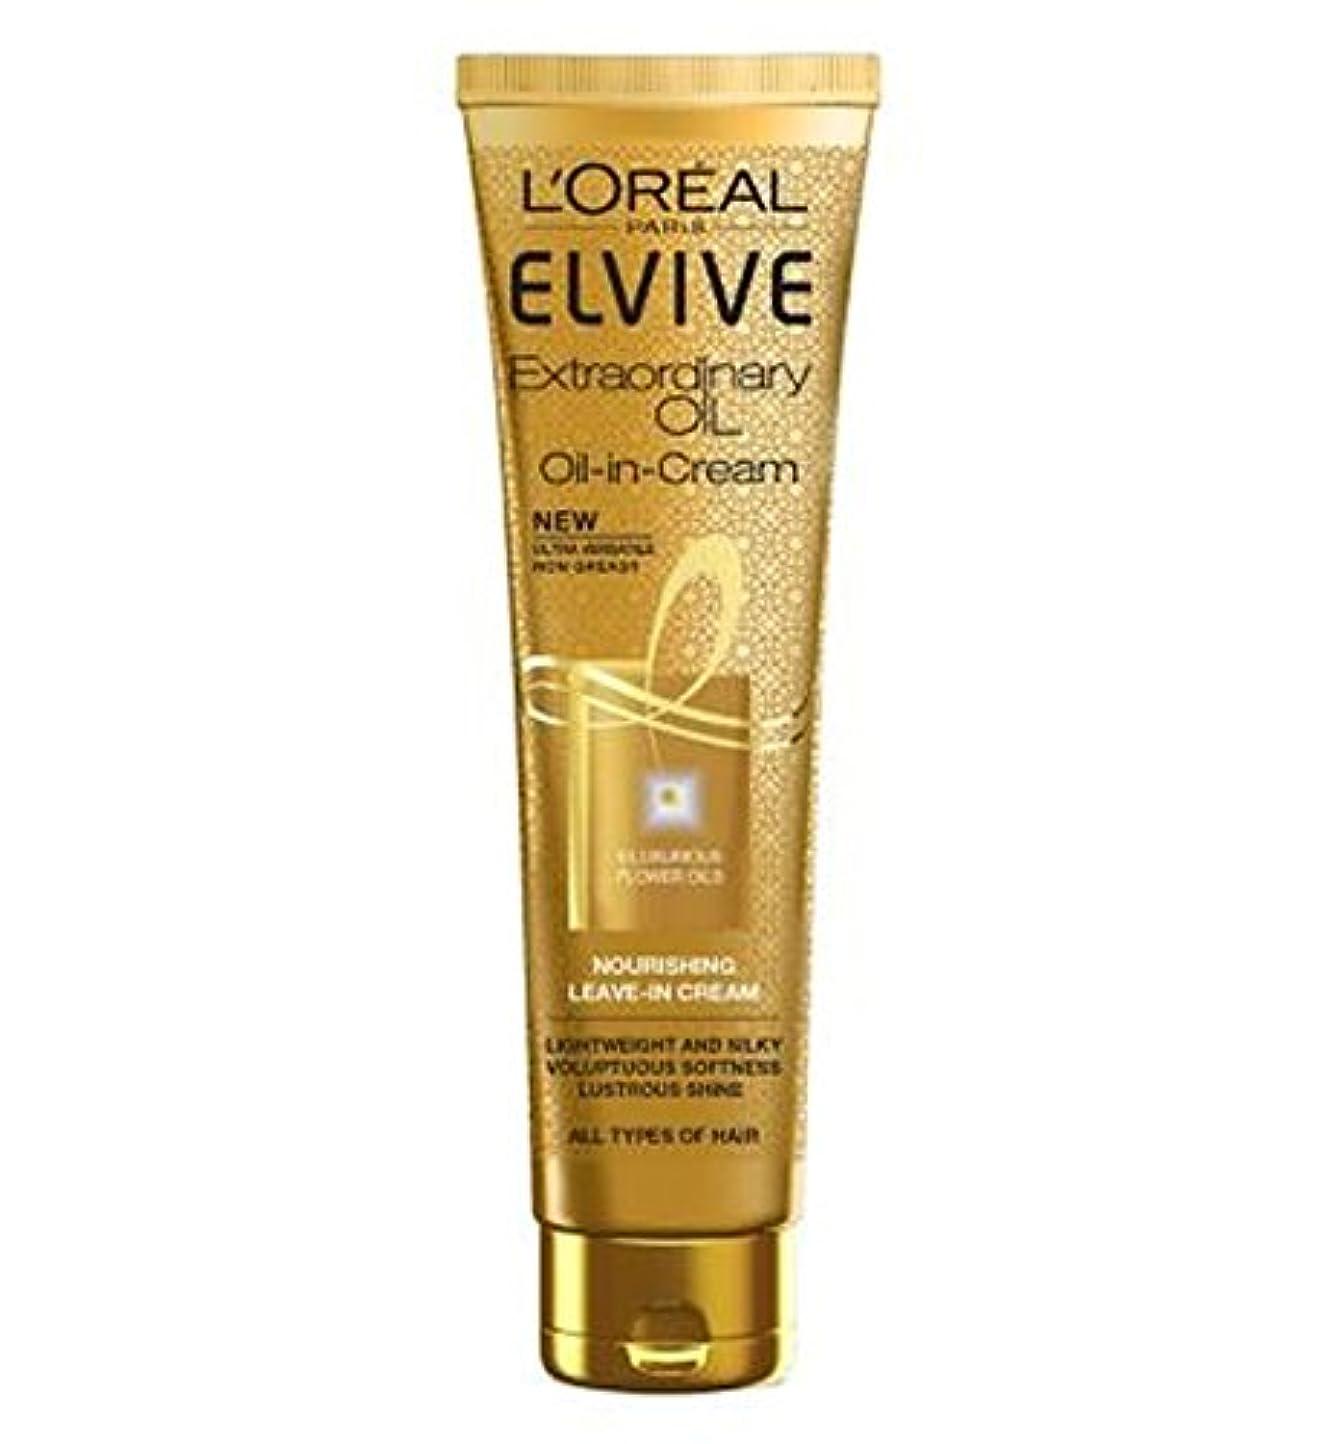 L'Oreal Paris Elvive Extraordinary Oil in Cream All Hair Types - すべての髪のタイプのクリームでロレアルパリElvive臨時オイル (L'Oreal) [並行輸入品]